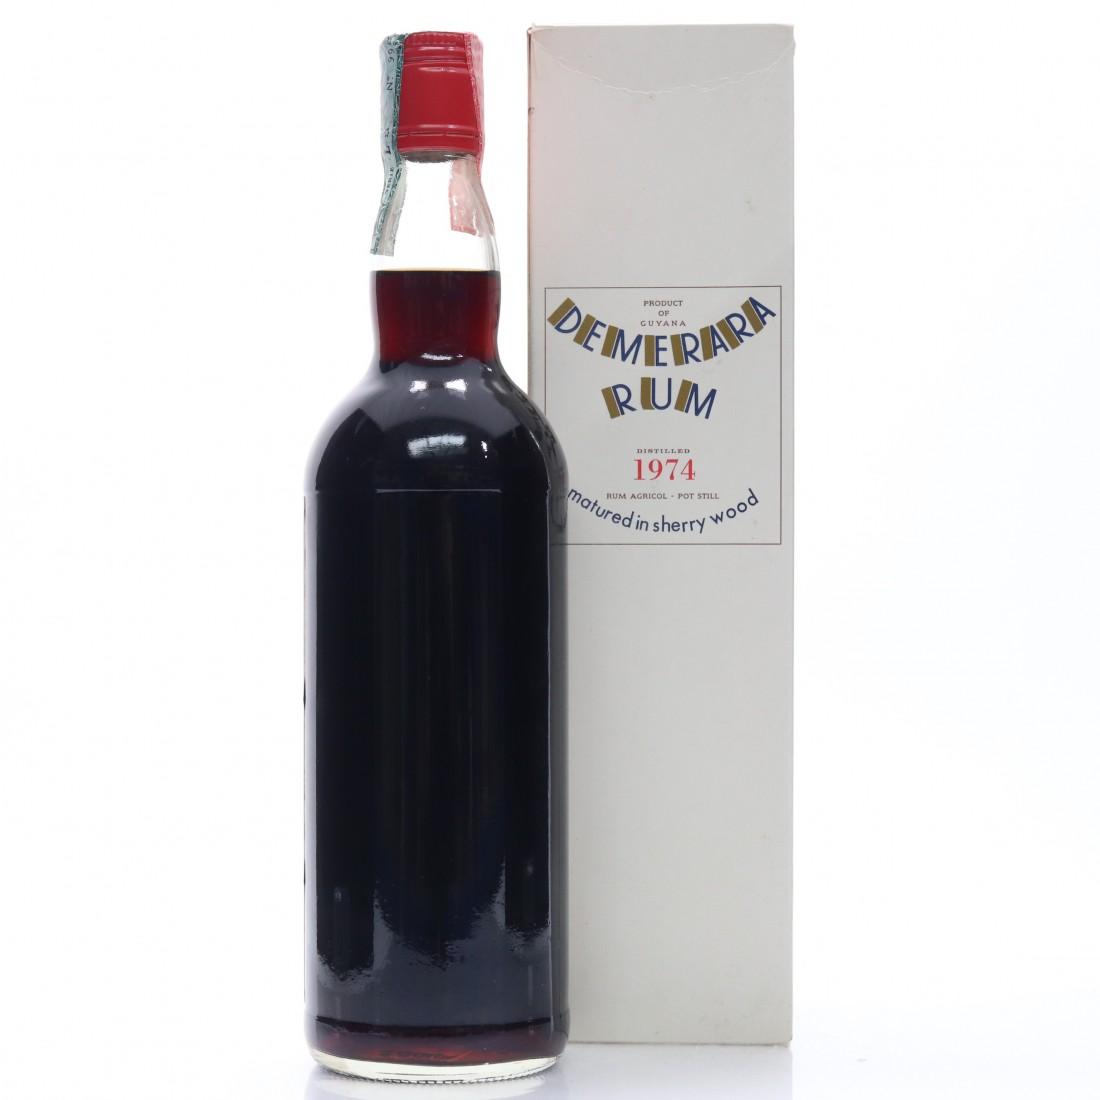 Demerara Rum 1974 Moon Import Sherry Wood